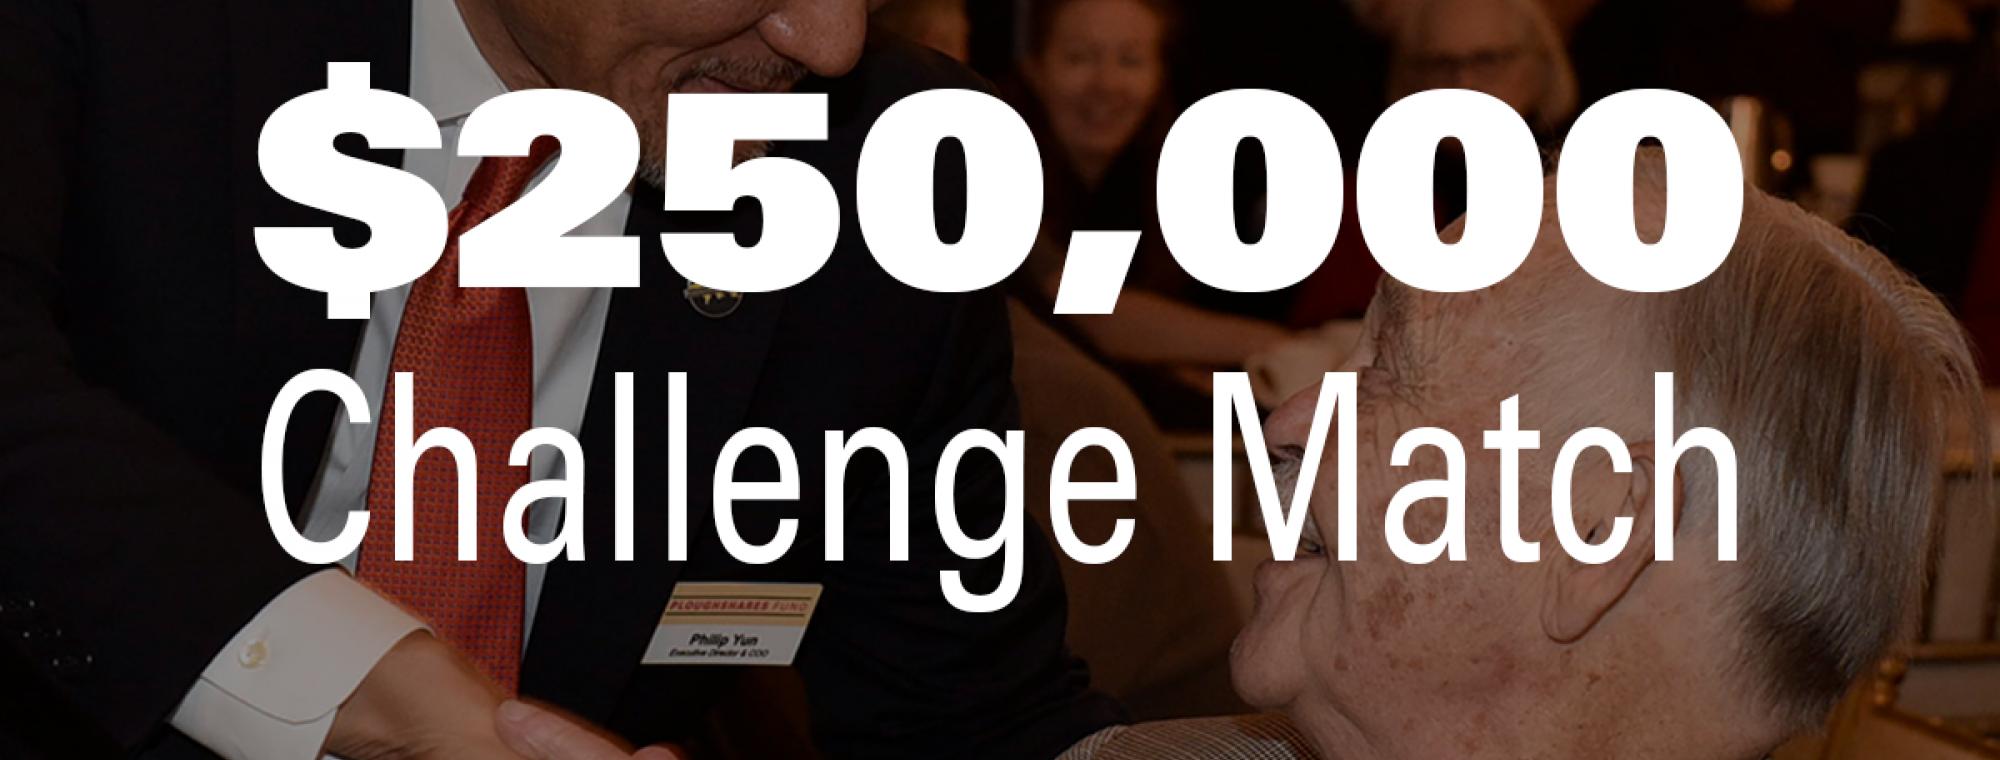 250,000 Challenge Match